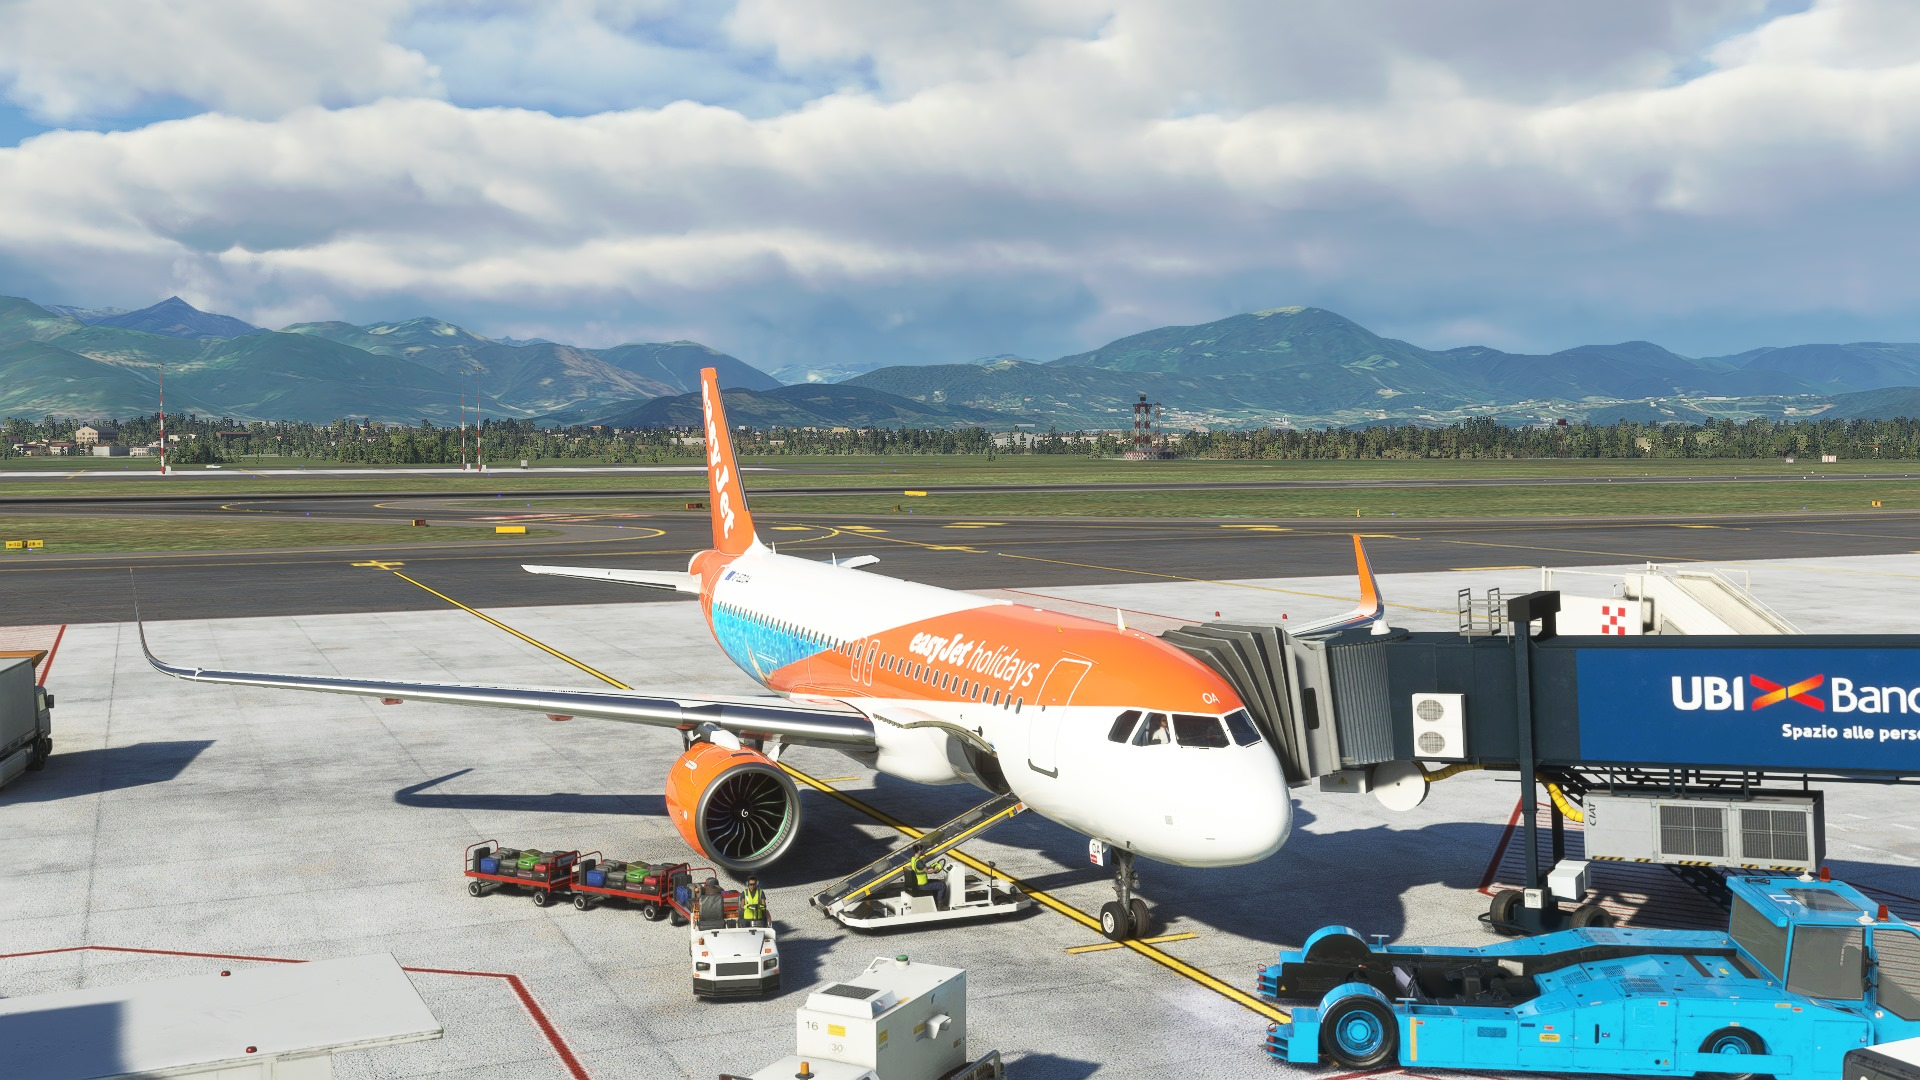 Microsoft Flight Simulator Bergamo